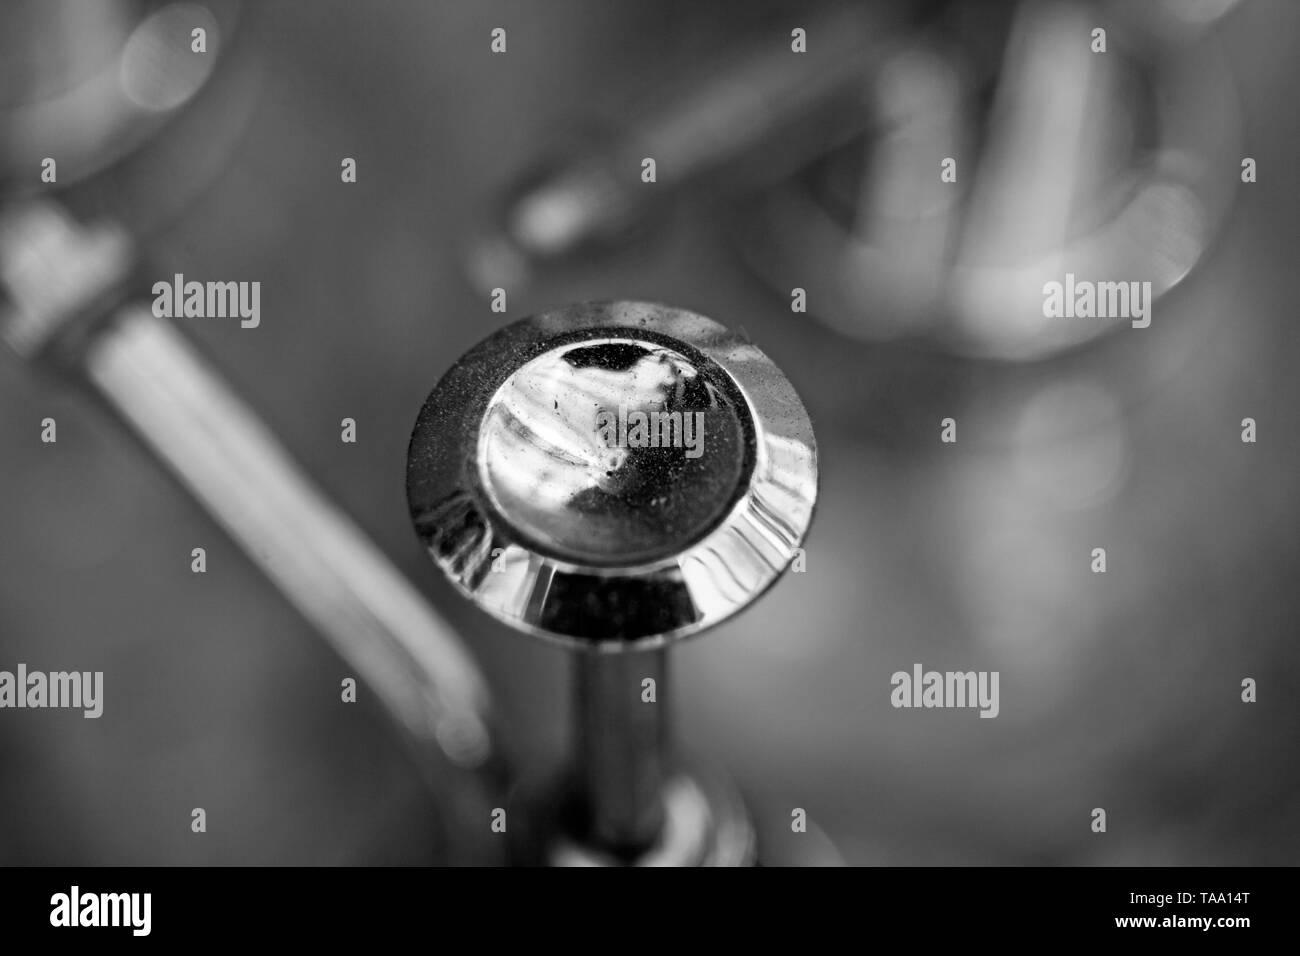 valve in black and white - Stock Image